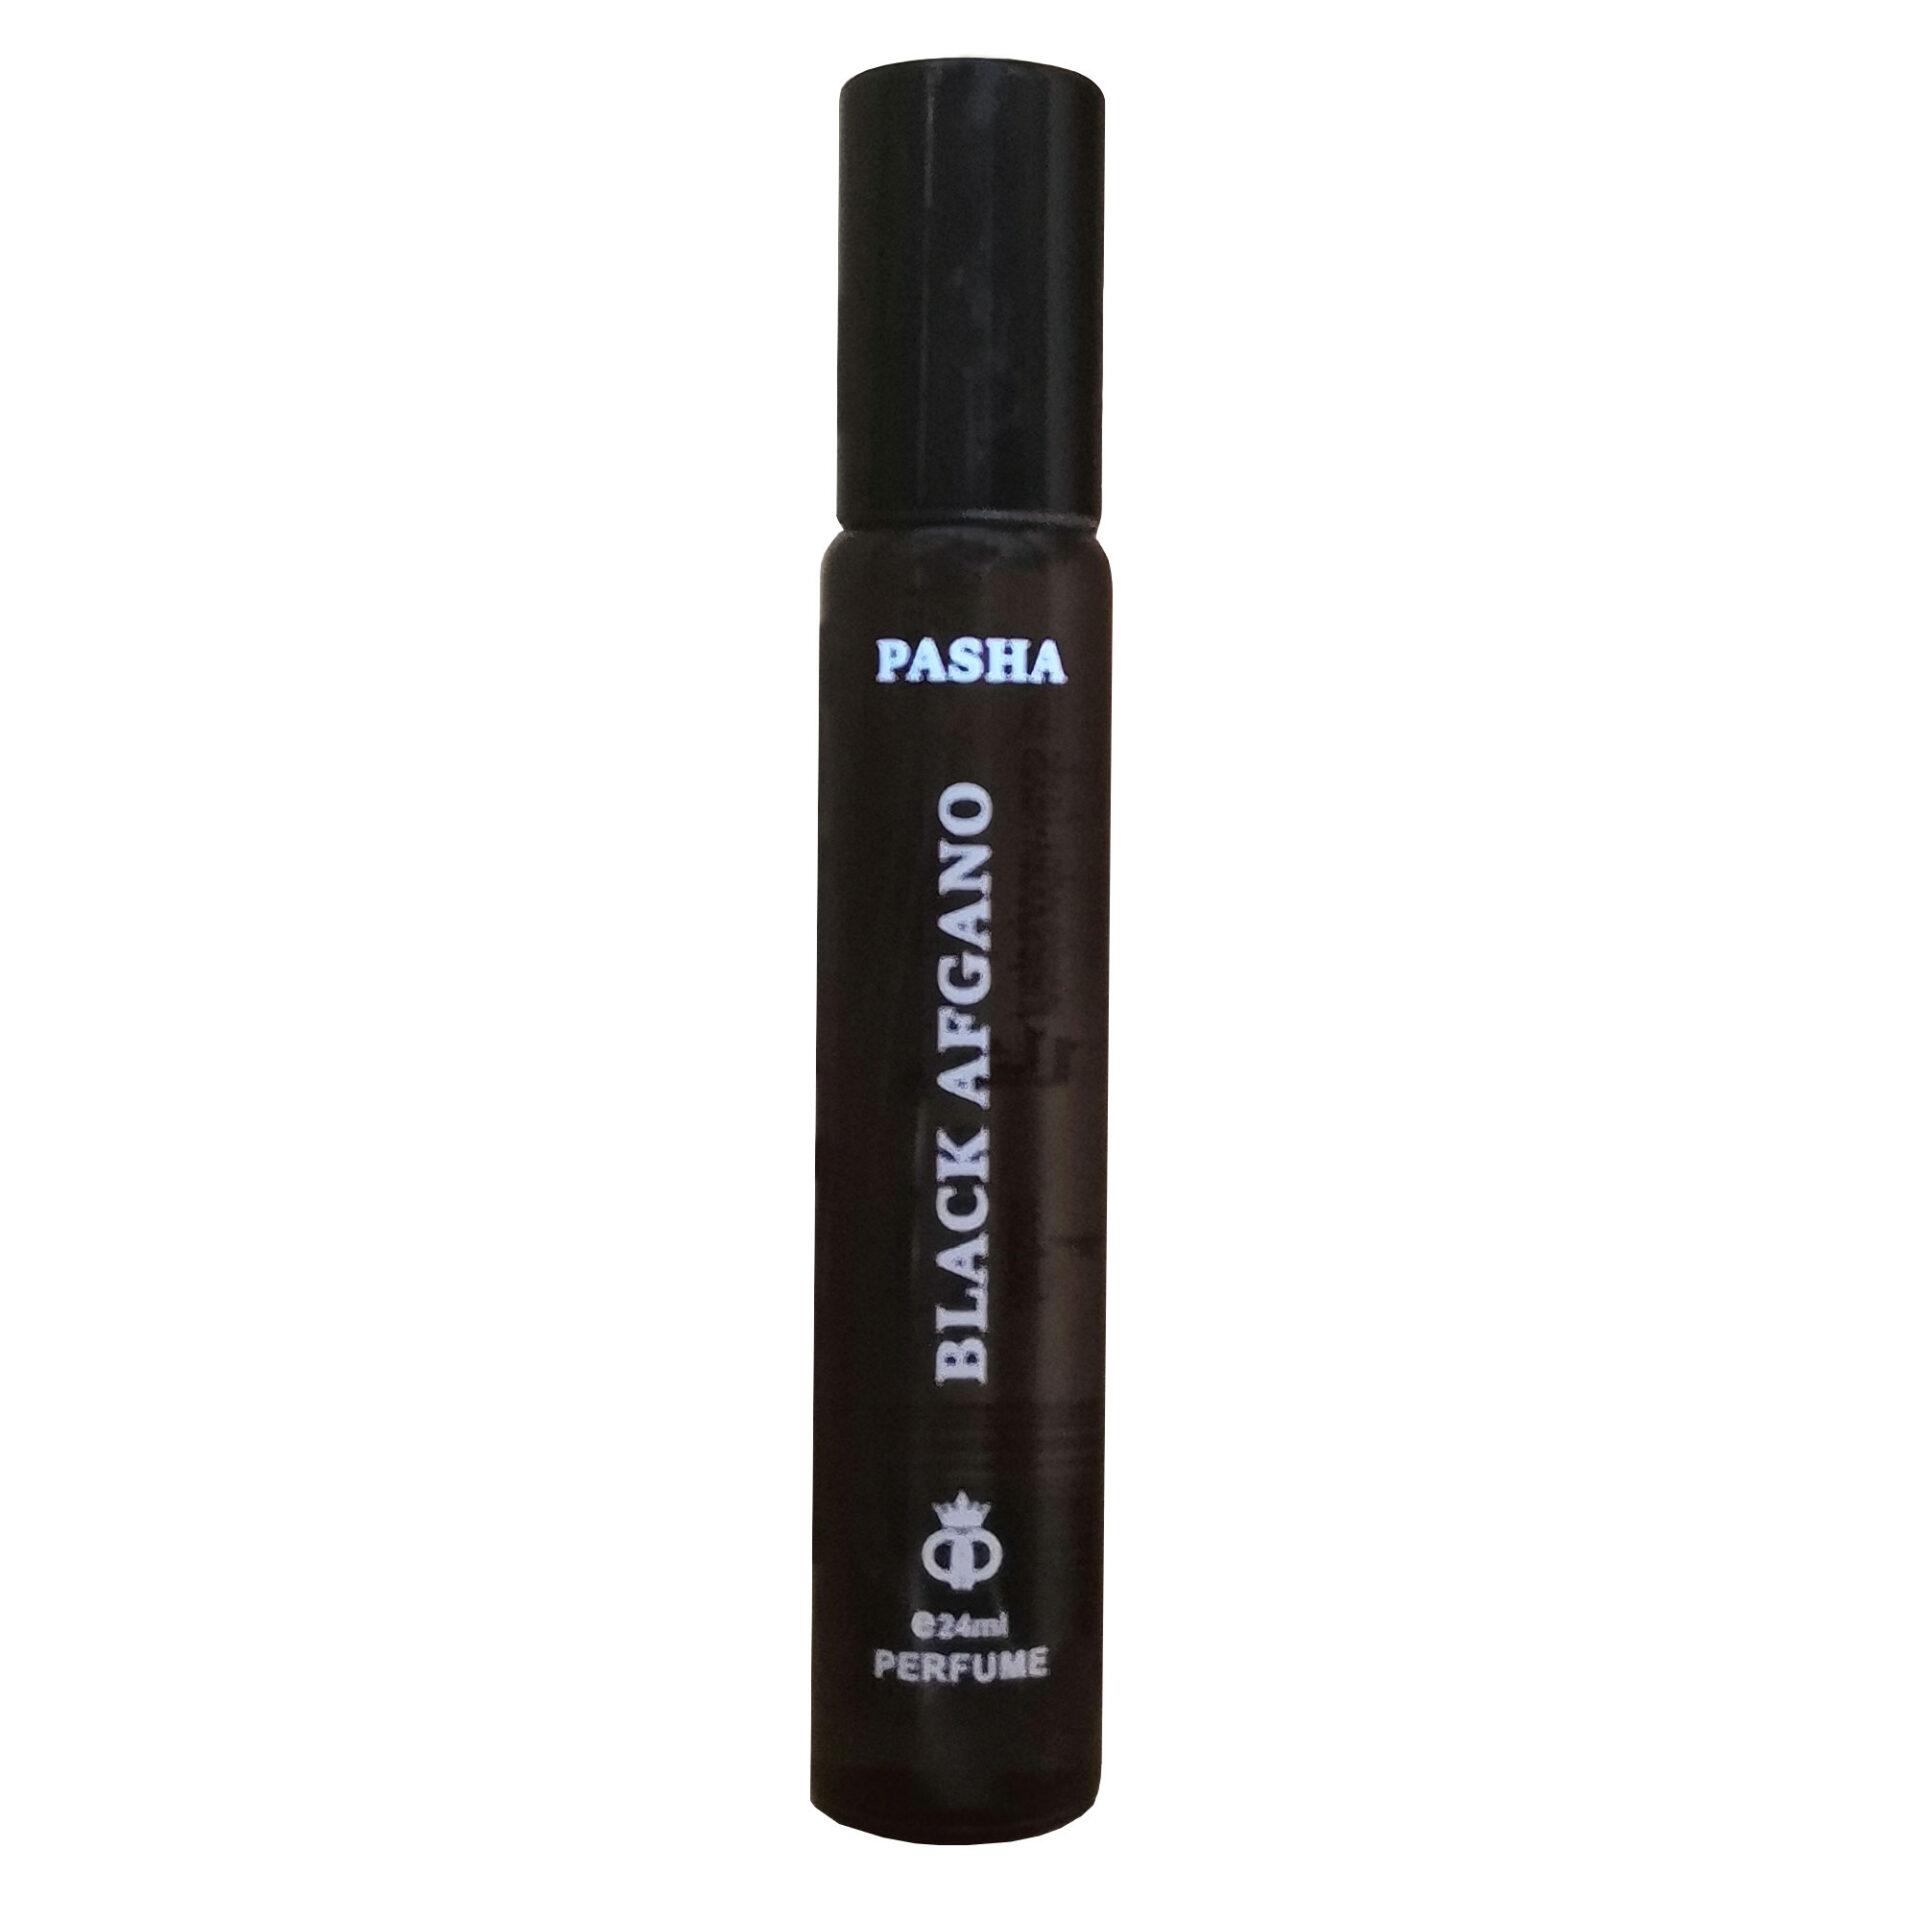 عطر جیبی مردانه پاشا مدل BLACK AFGHANO حجم 24 میلی لیتر